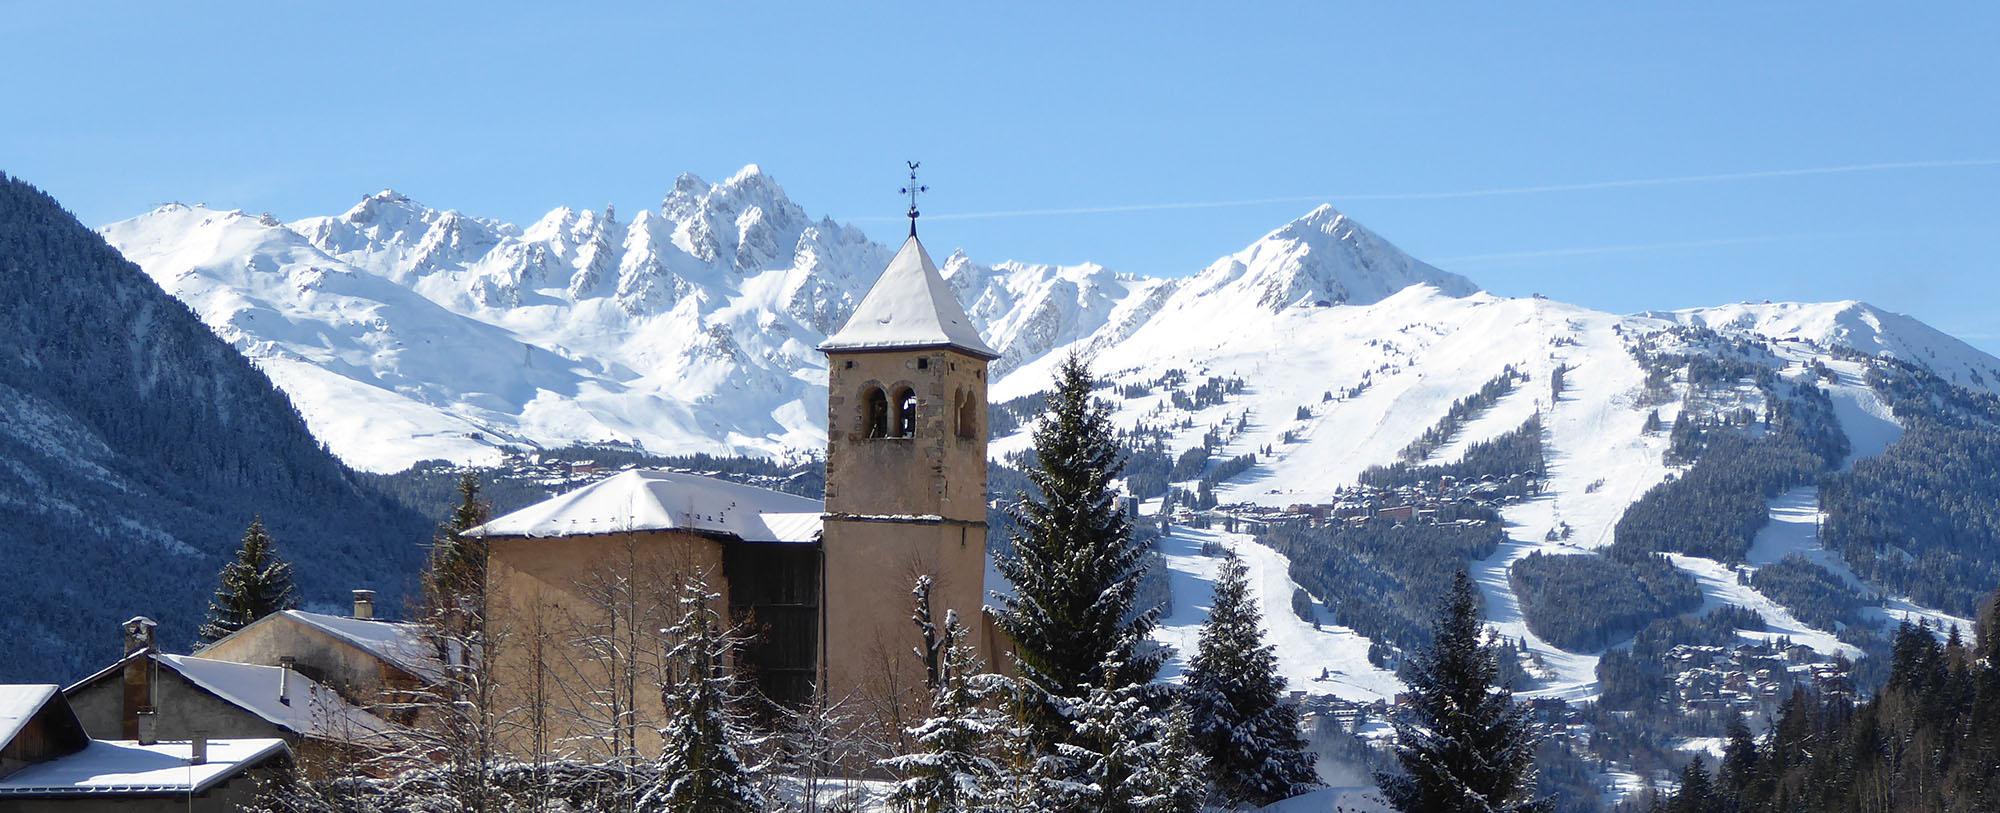 Champagny en Vanoise Ski Champagny en Vanoise »